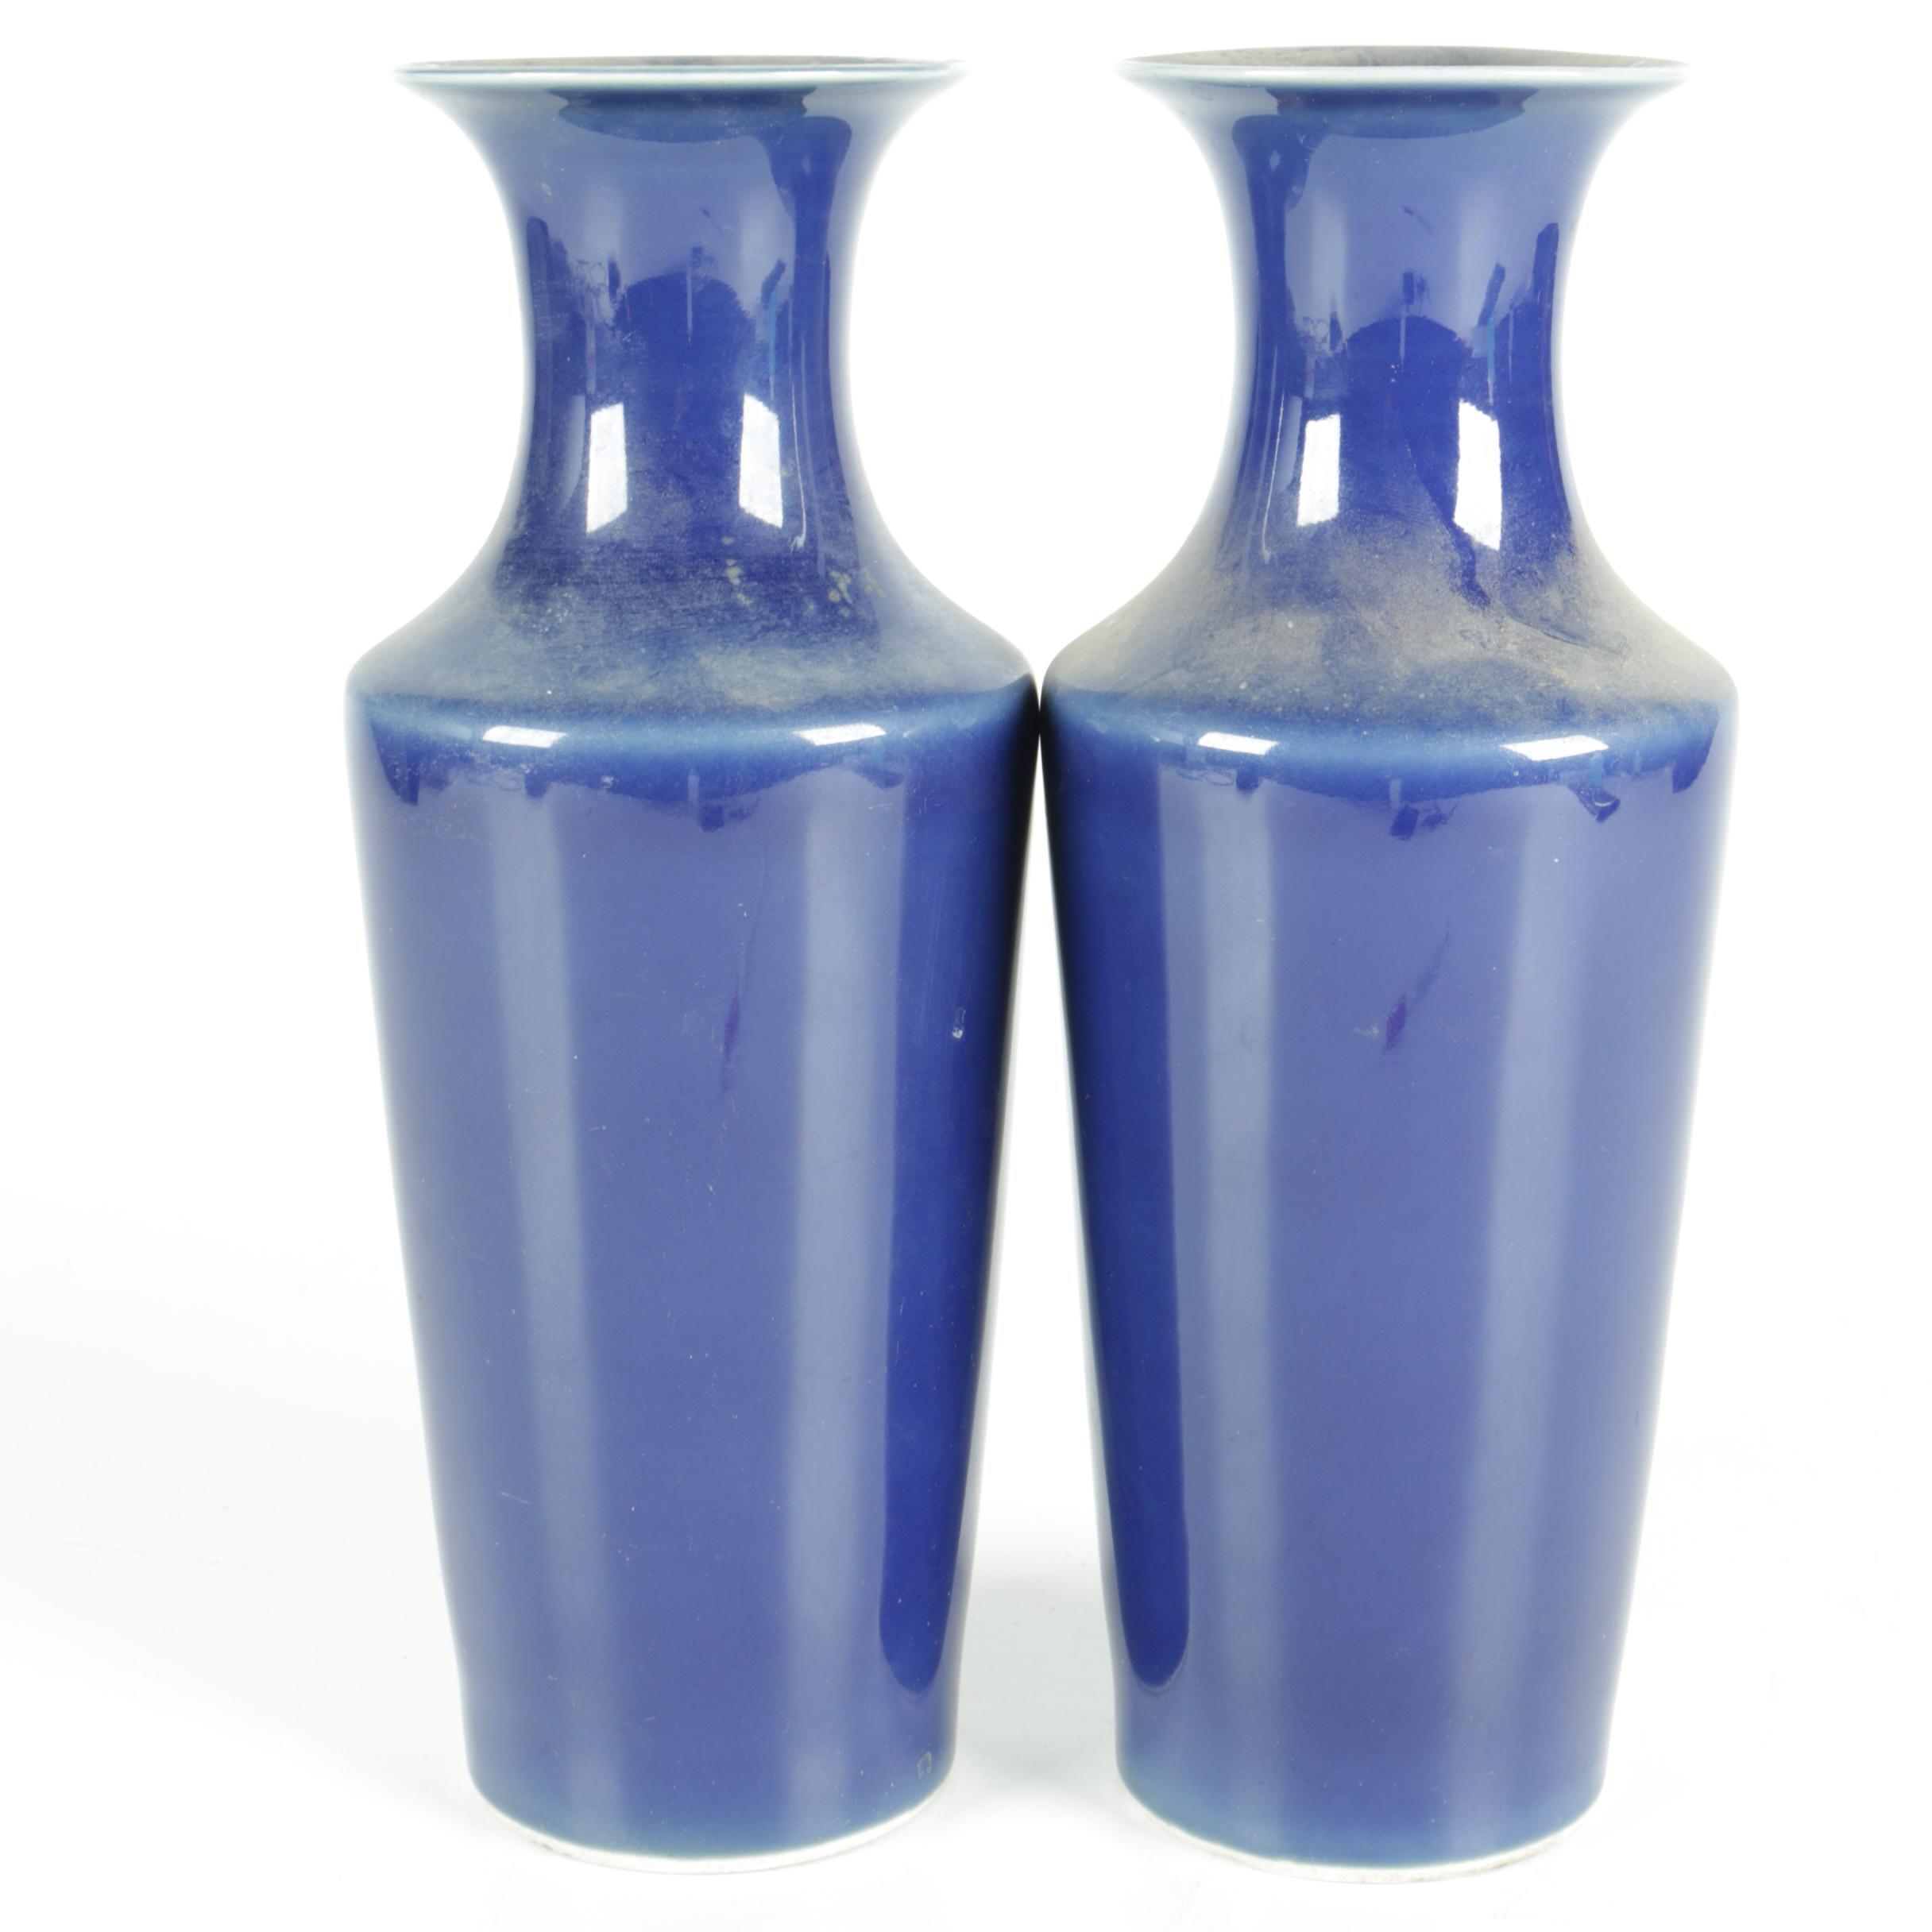 Pair of Monochrome Azure Blue Vases